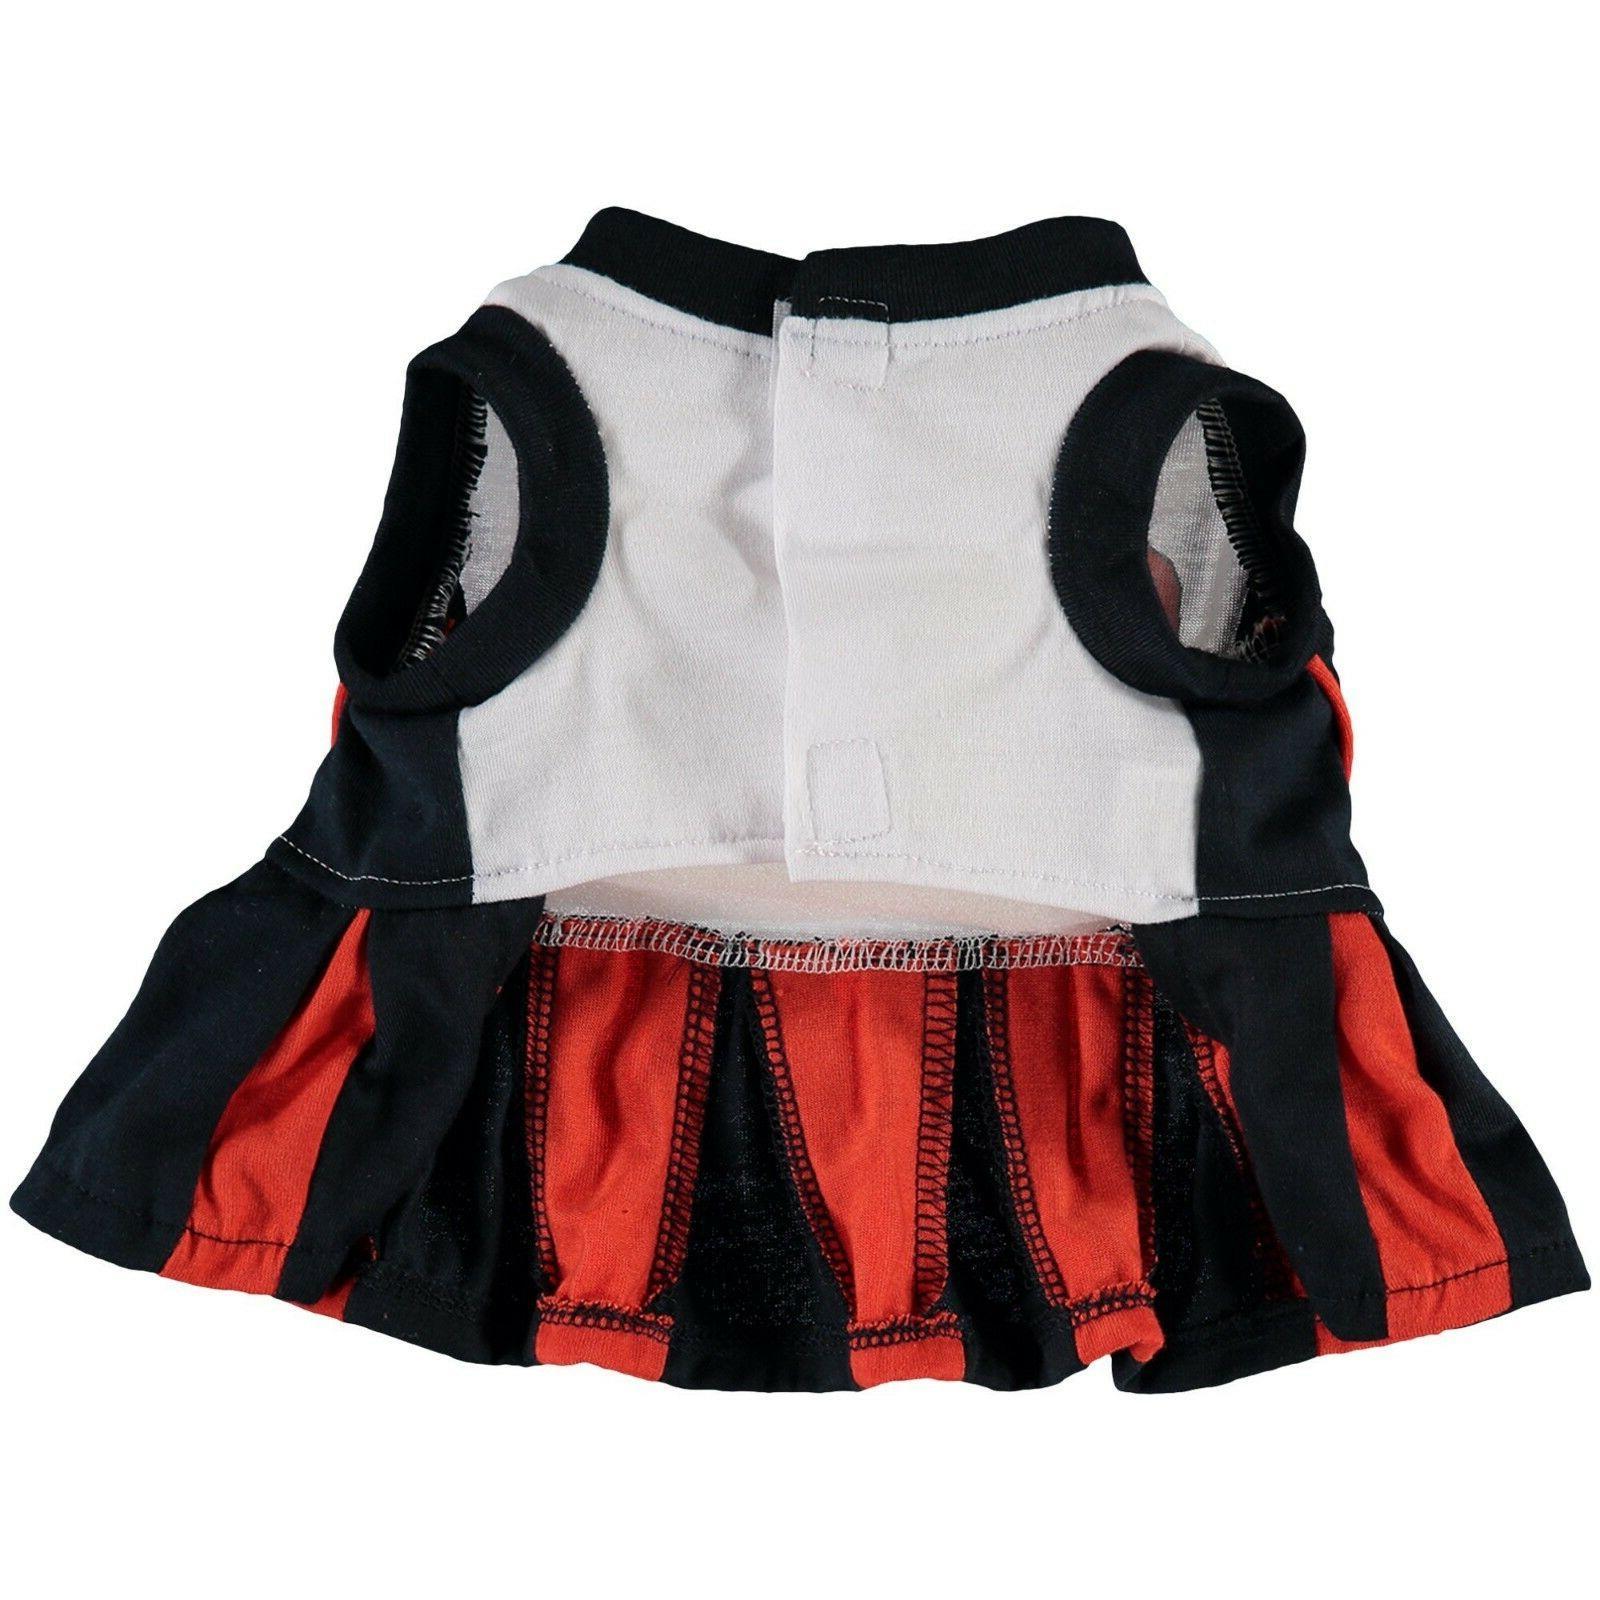 Chicago Cheerleader Outfit Medium